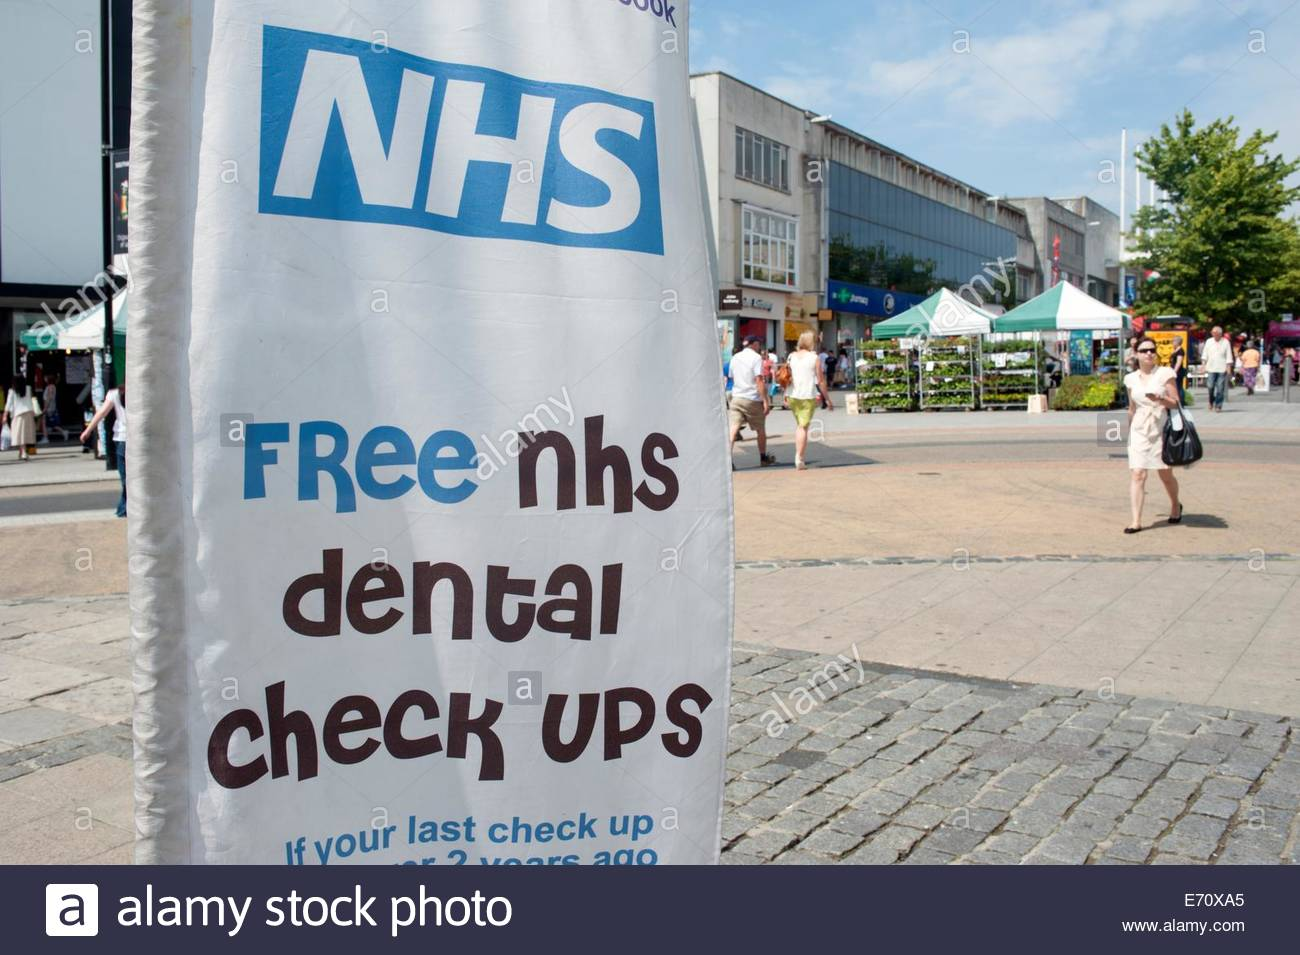 Southampton UK Stall promoting Free NHS dental check-ups. - Stock Image